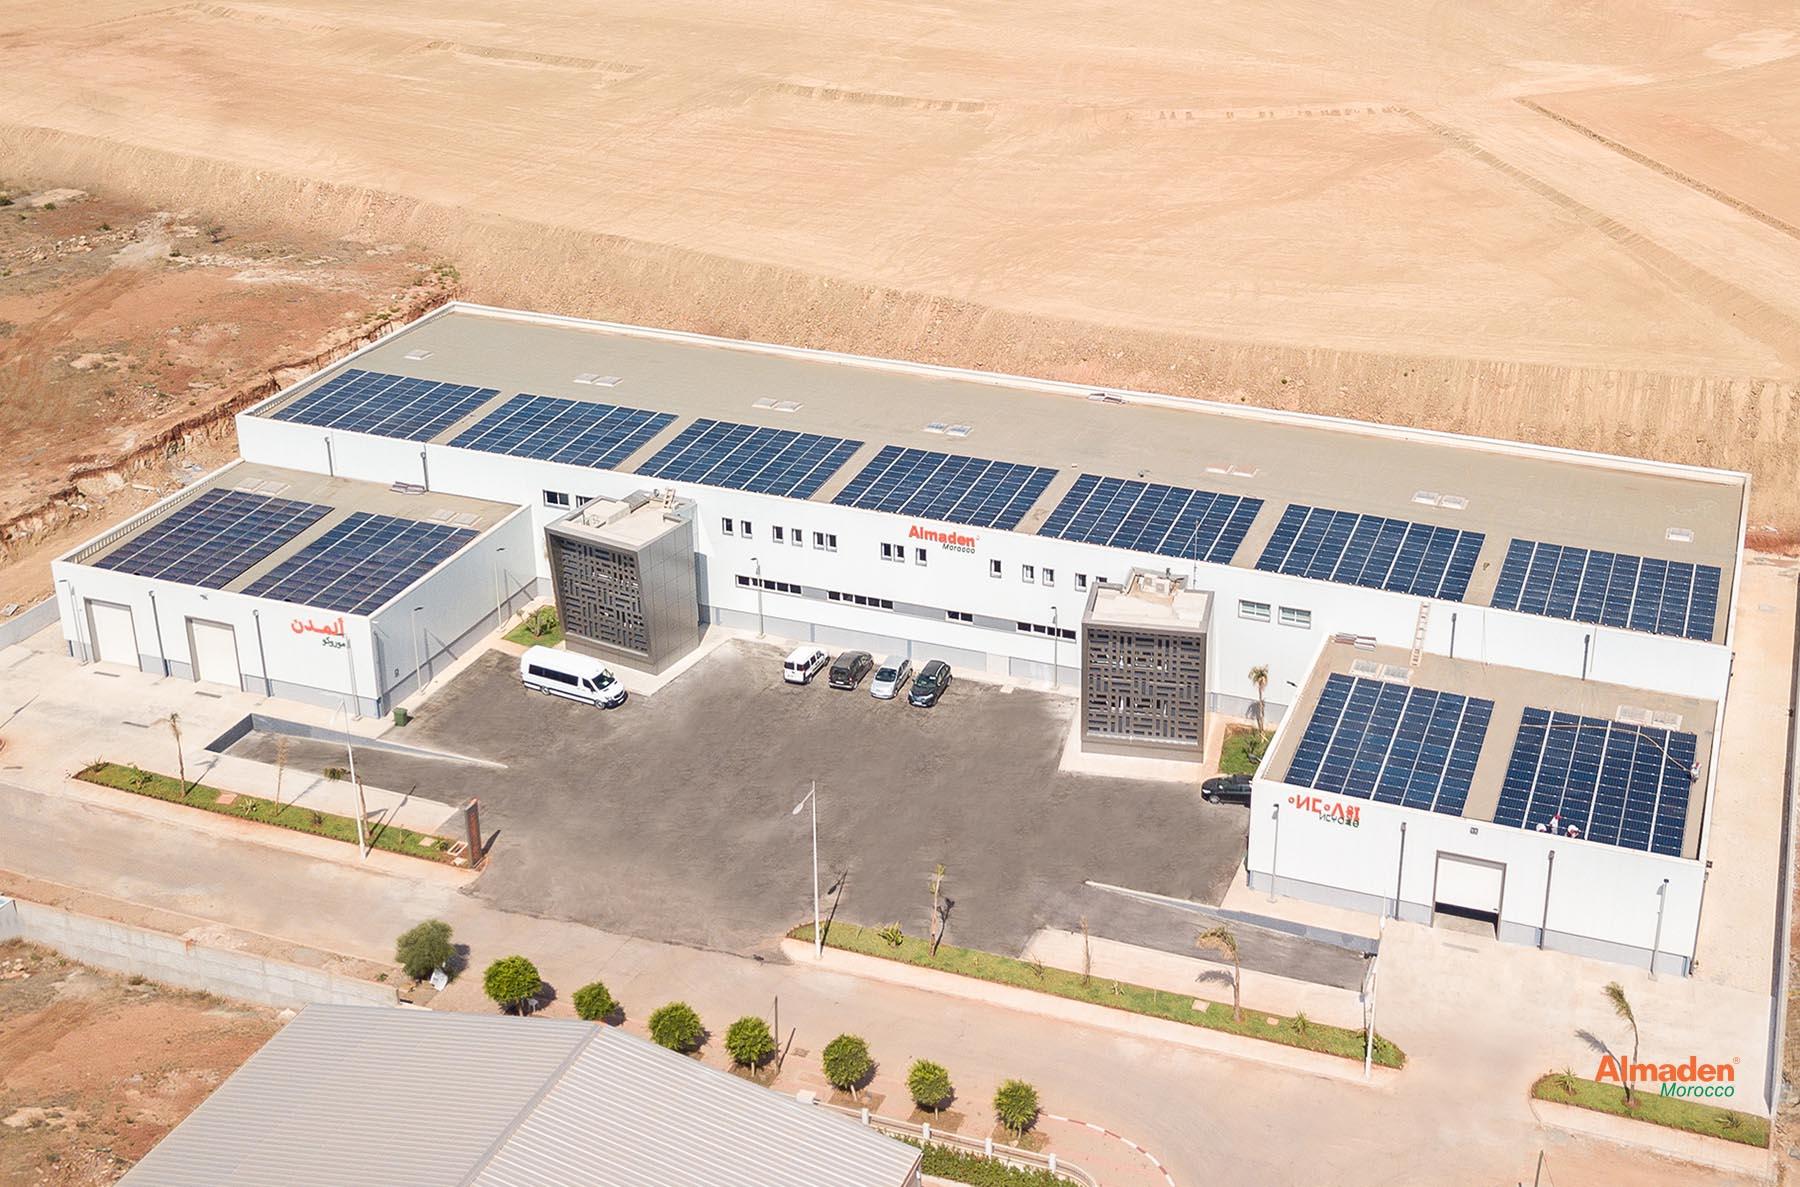 factory-morocco-photovoltaic-solar-panels-bitumen-flat-roof